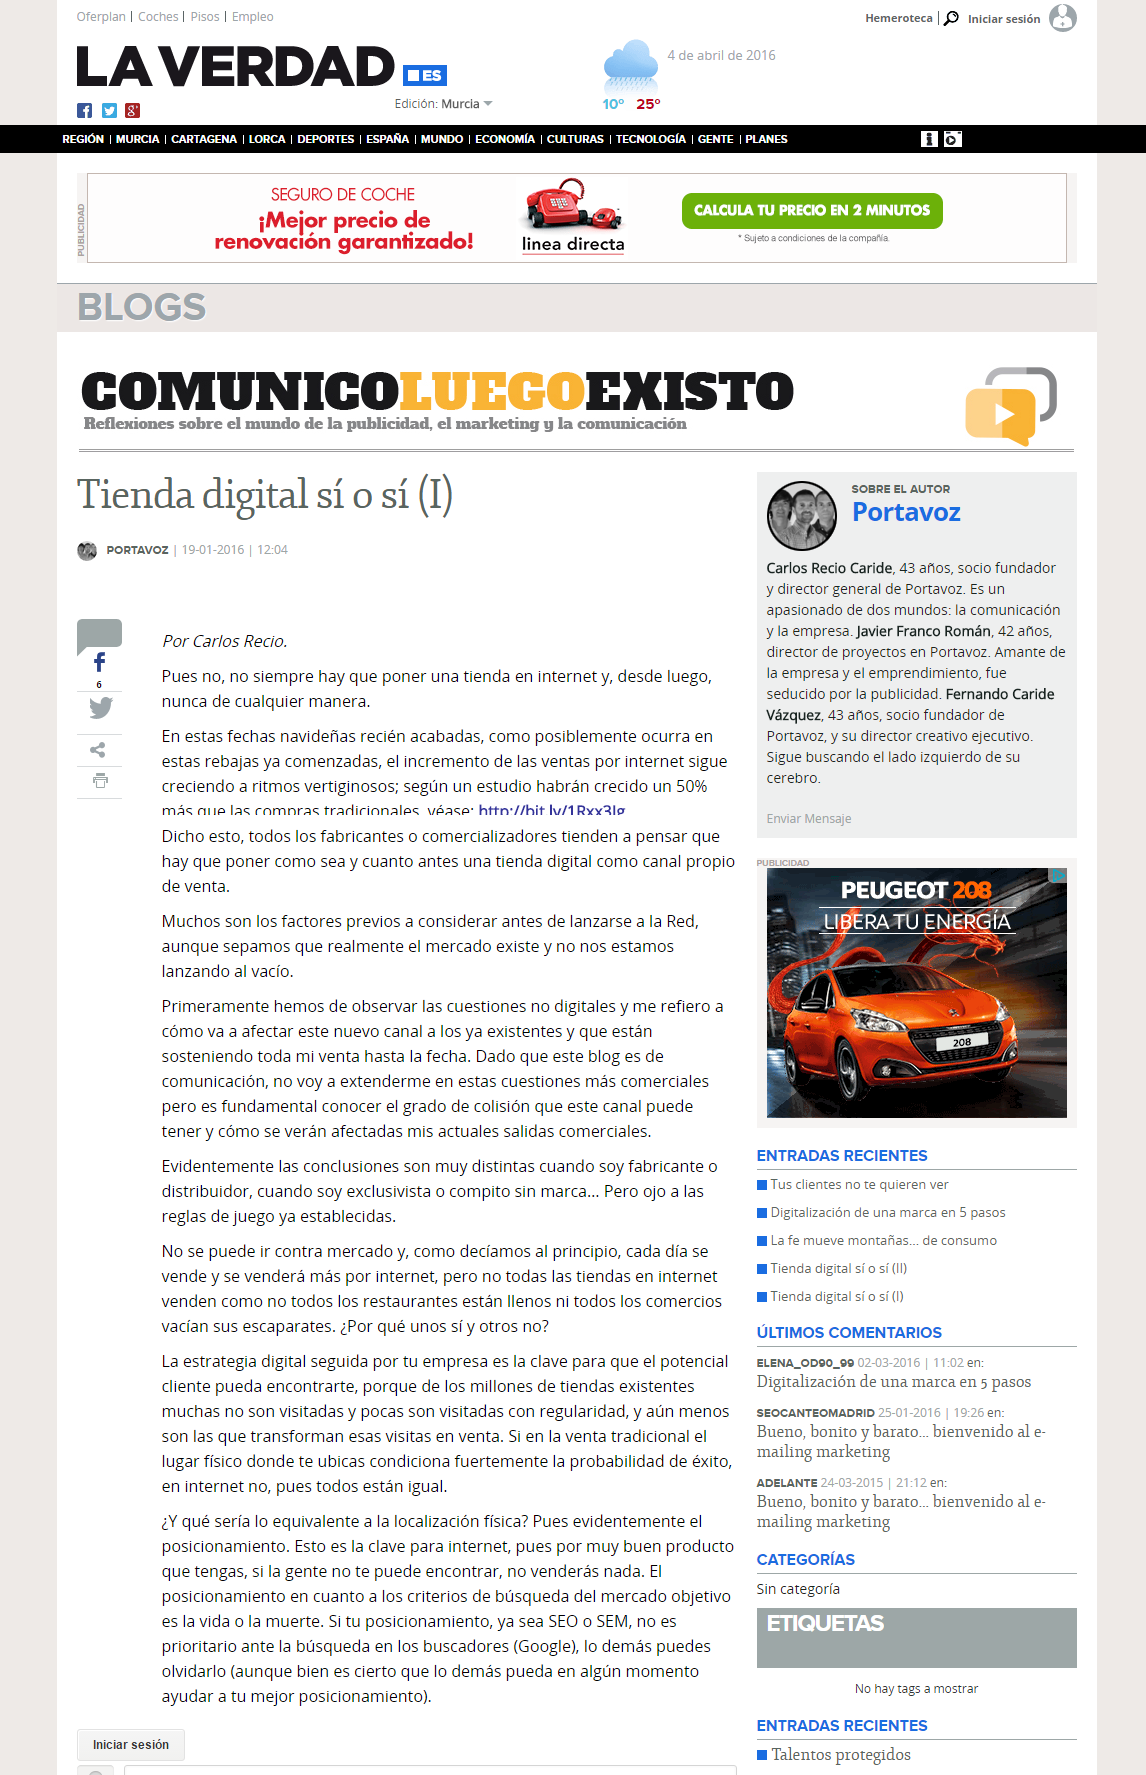 FireShot Capture 77 - Tienda digital sí o sí (I) I Comunico,_ - http___blogs.laverdad.es_comunicol